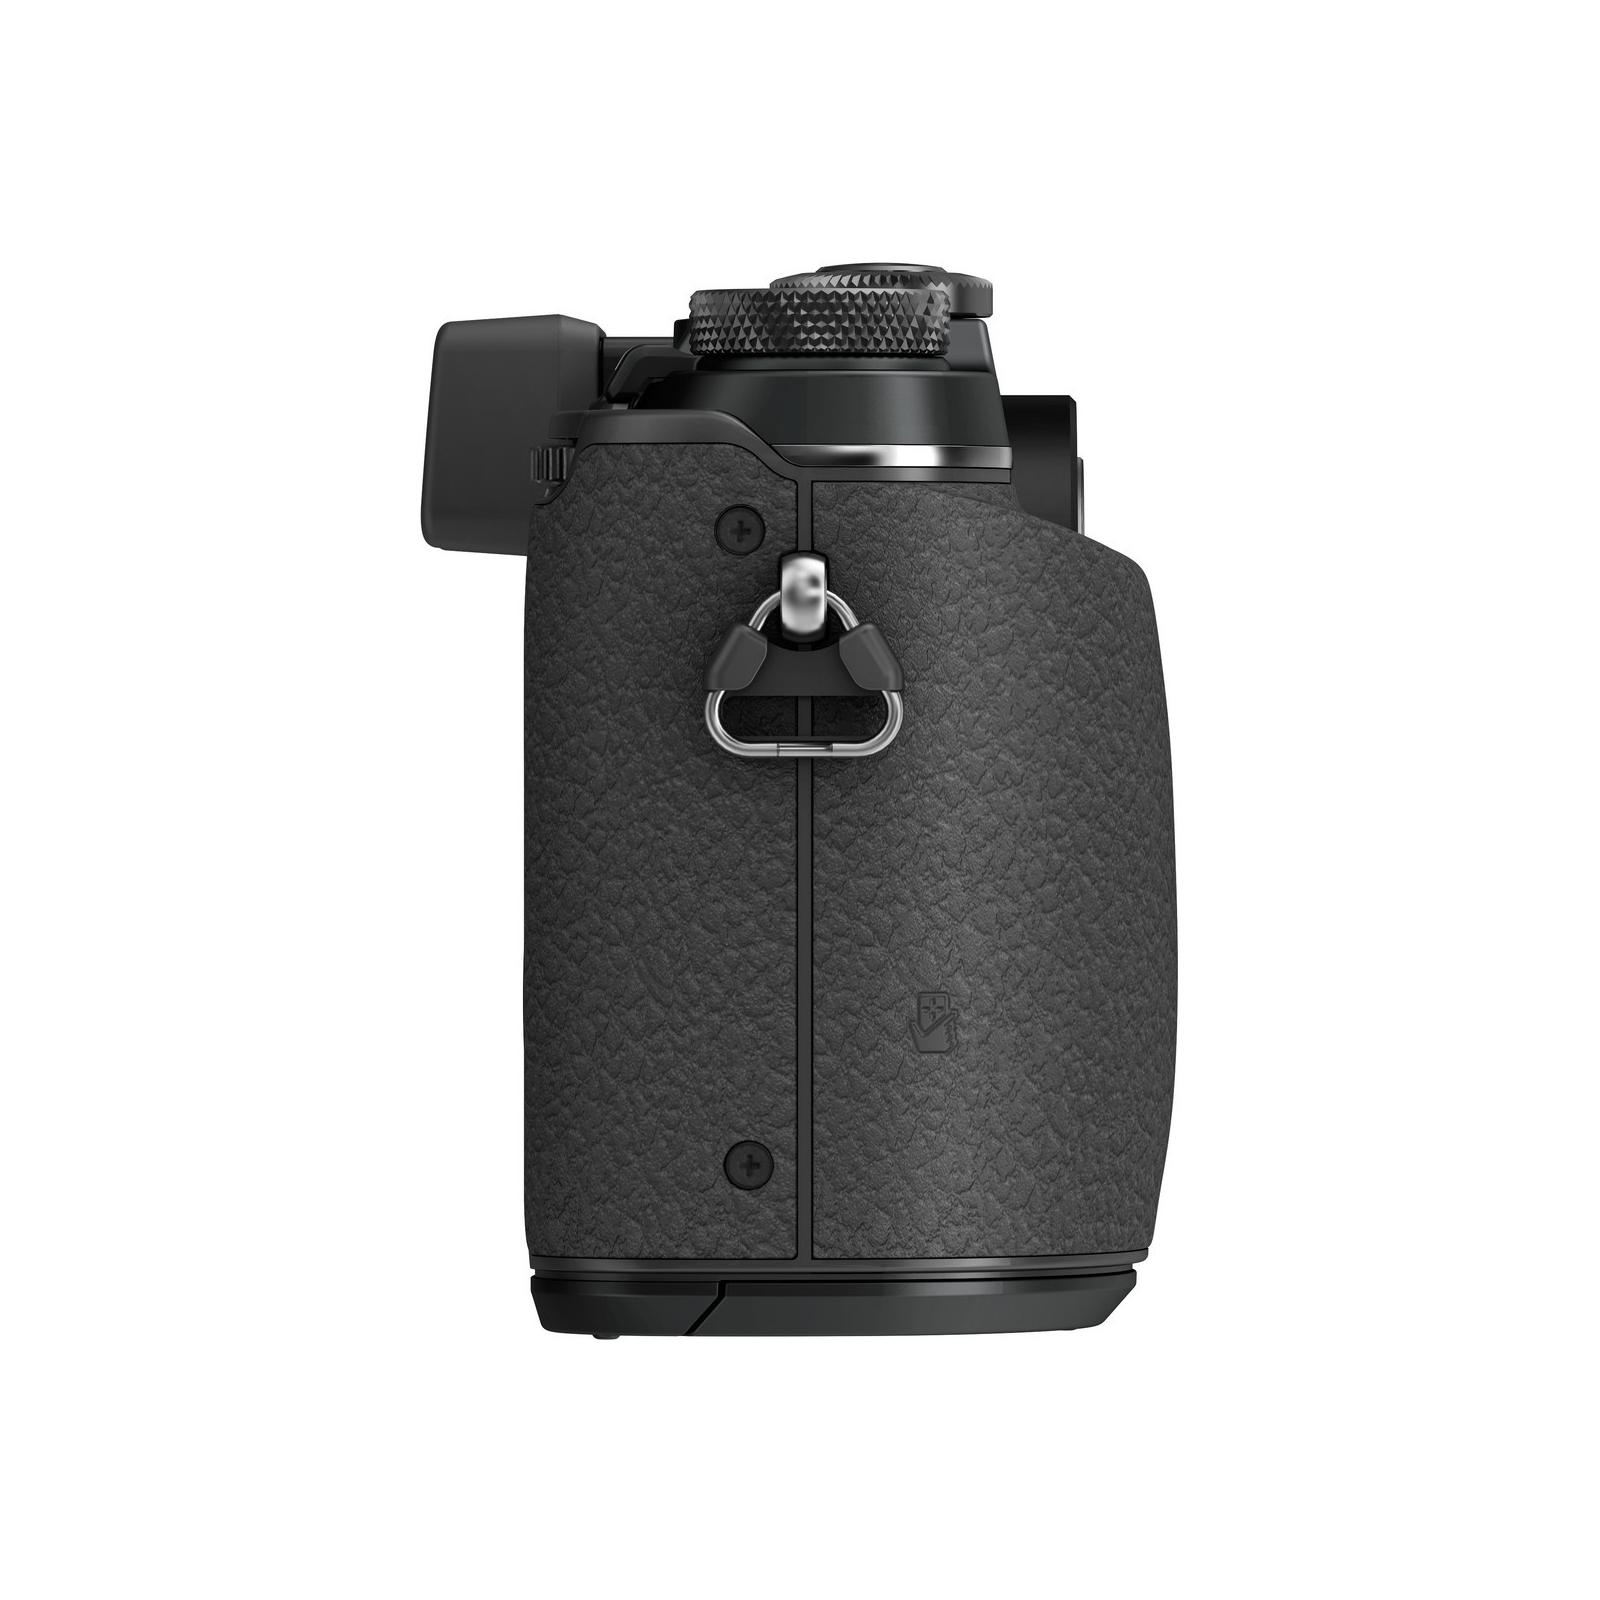 Цифровой фотоаппарат PANASONIC DMC-GX7 Body (DMC-GX7EE-K) изображение 4